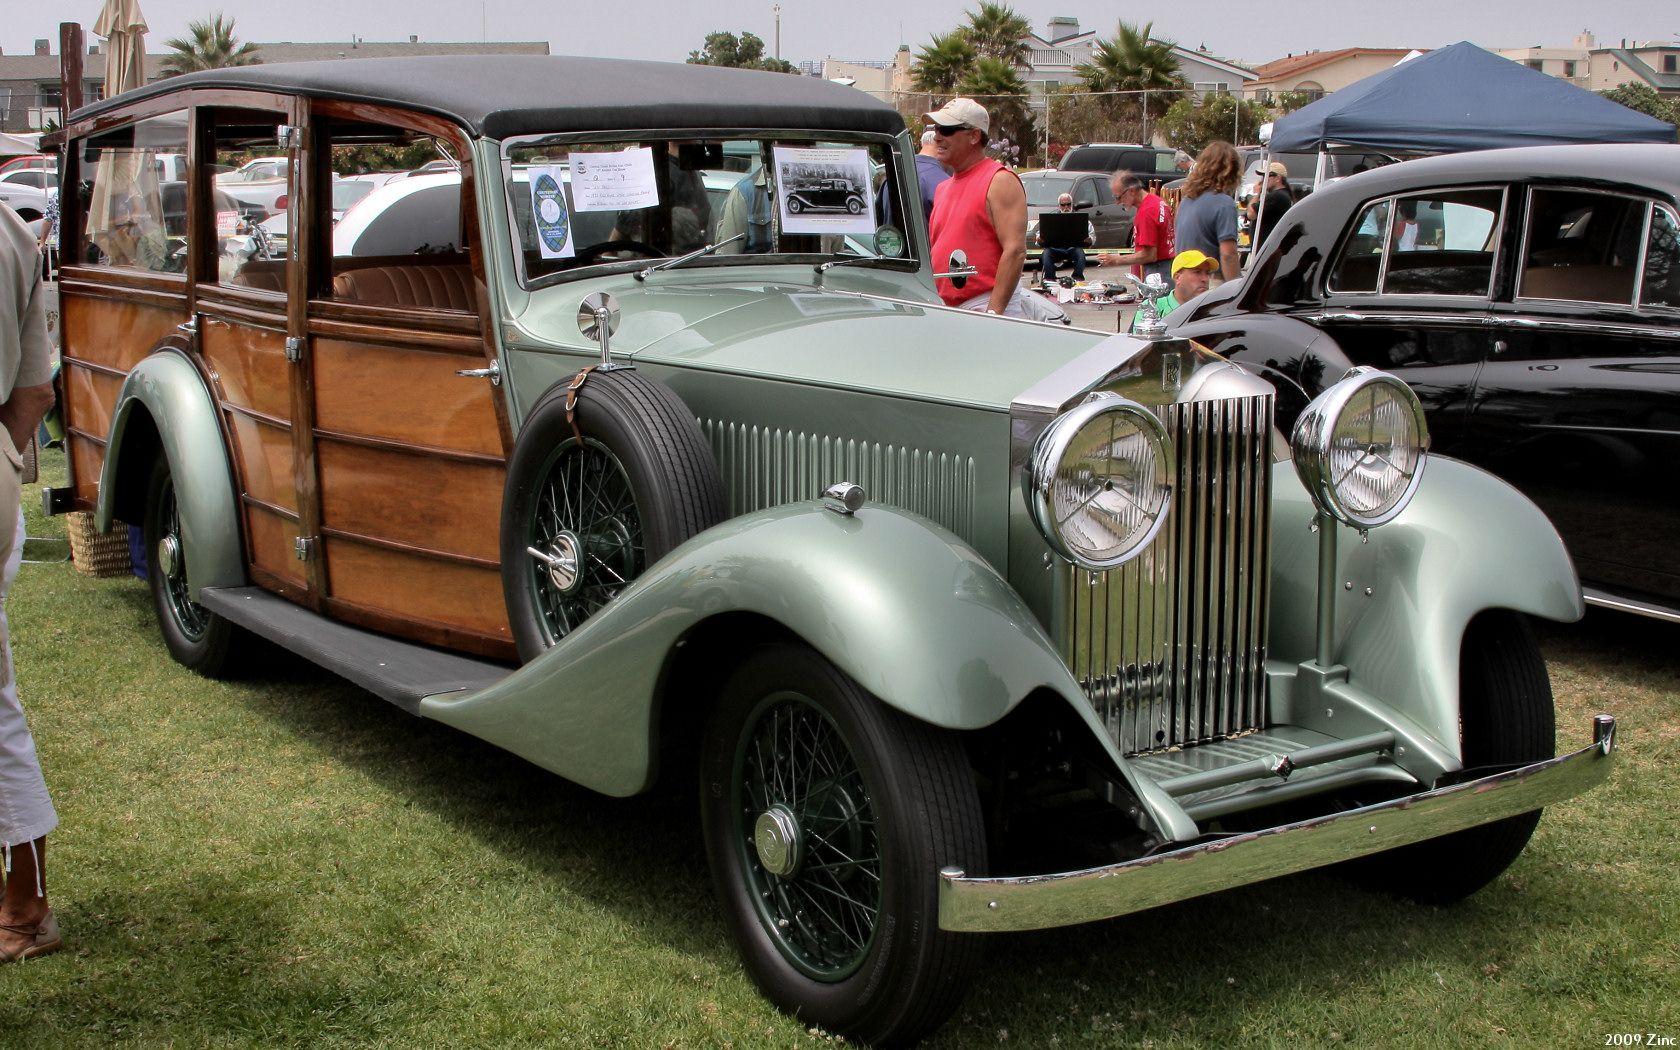 File:1933 Rolls Royce Shooting Brake - 1941 WWII mod - fvr.jpg